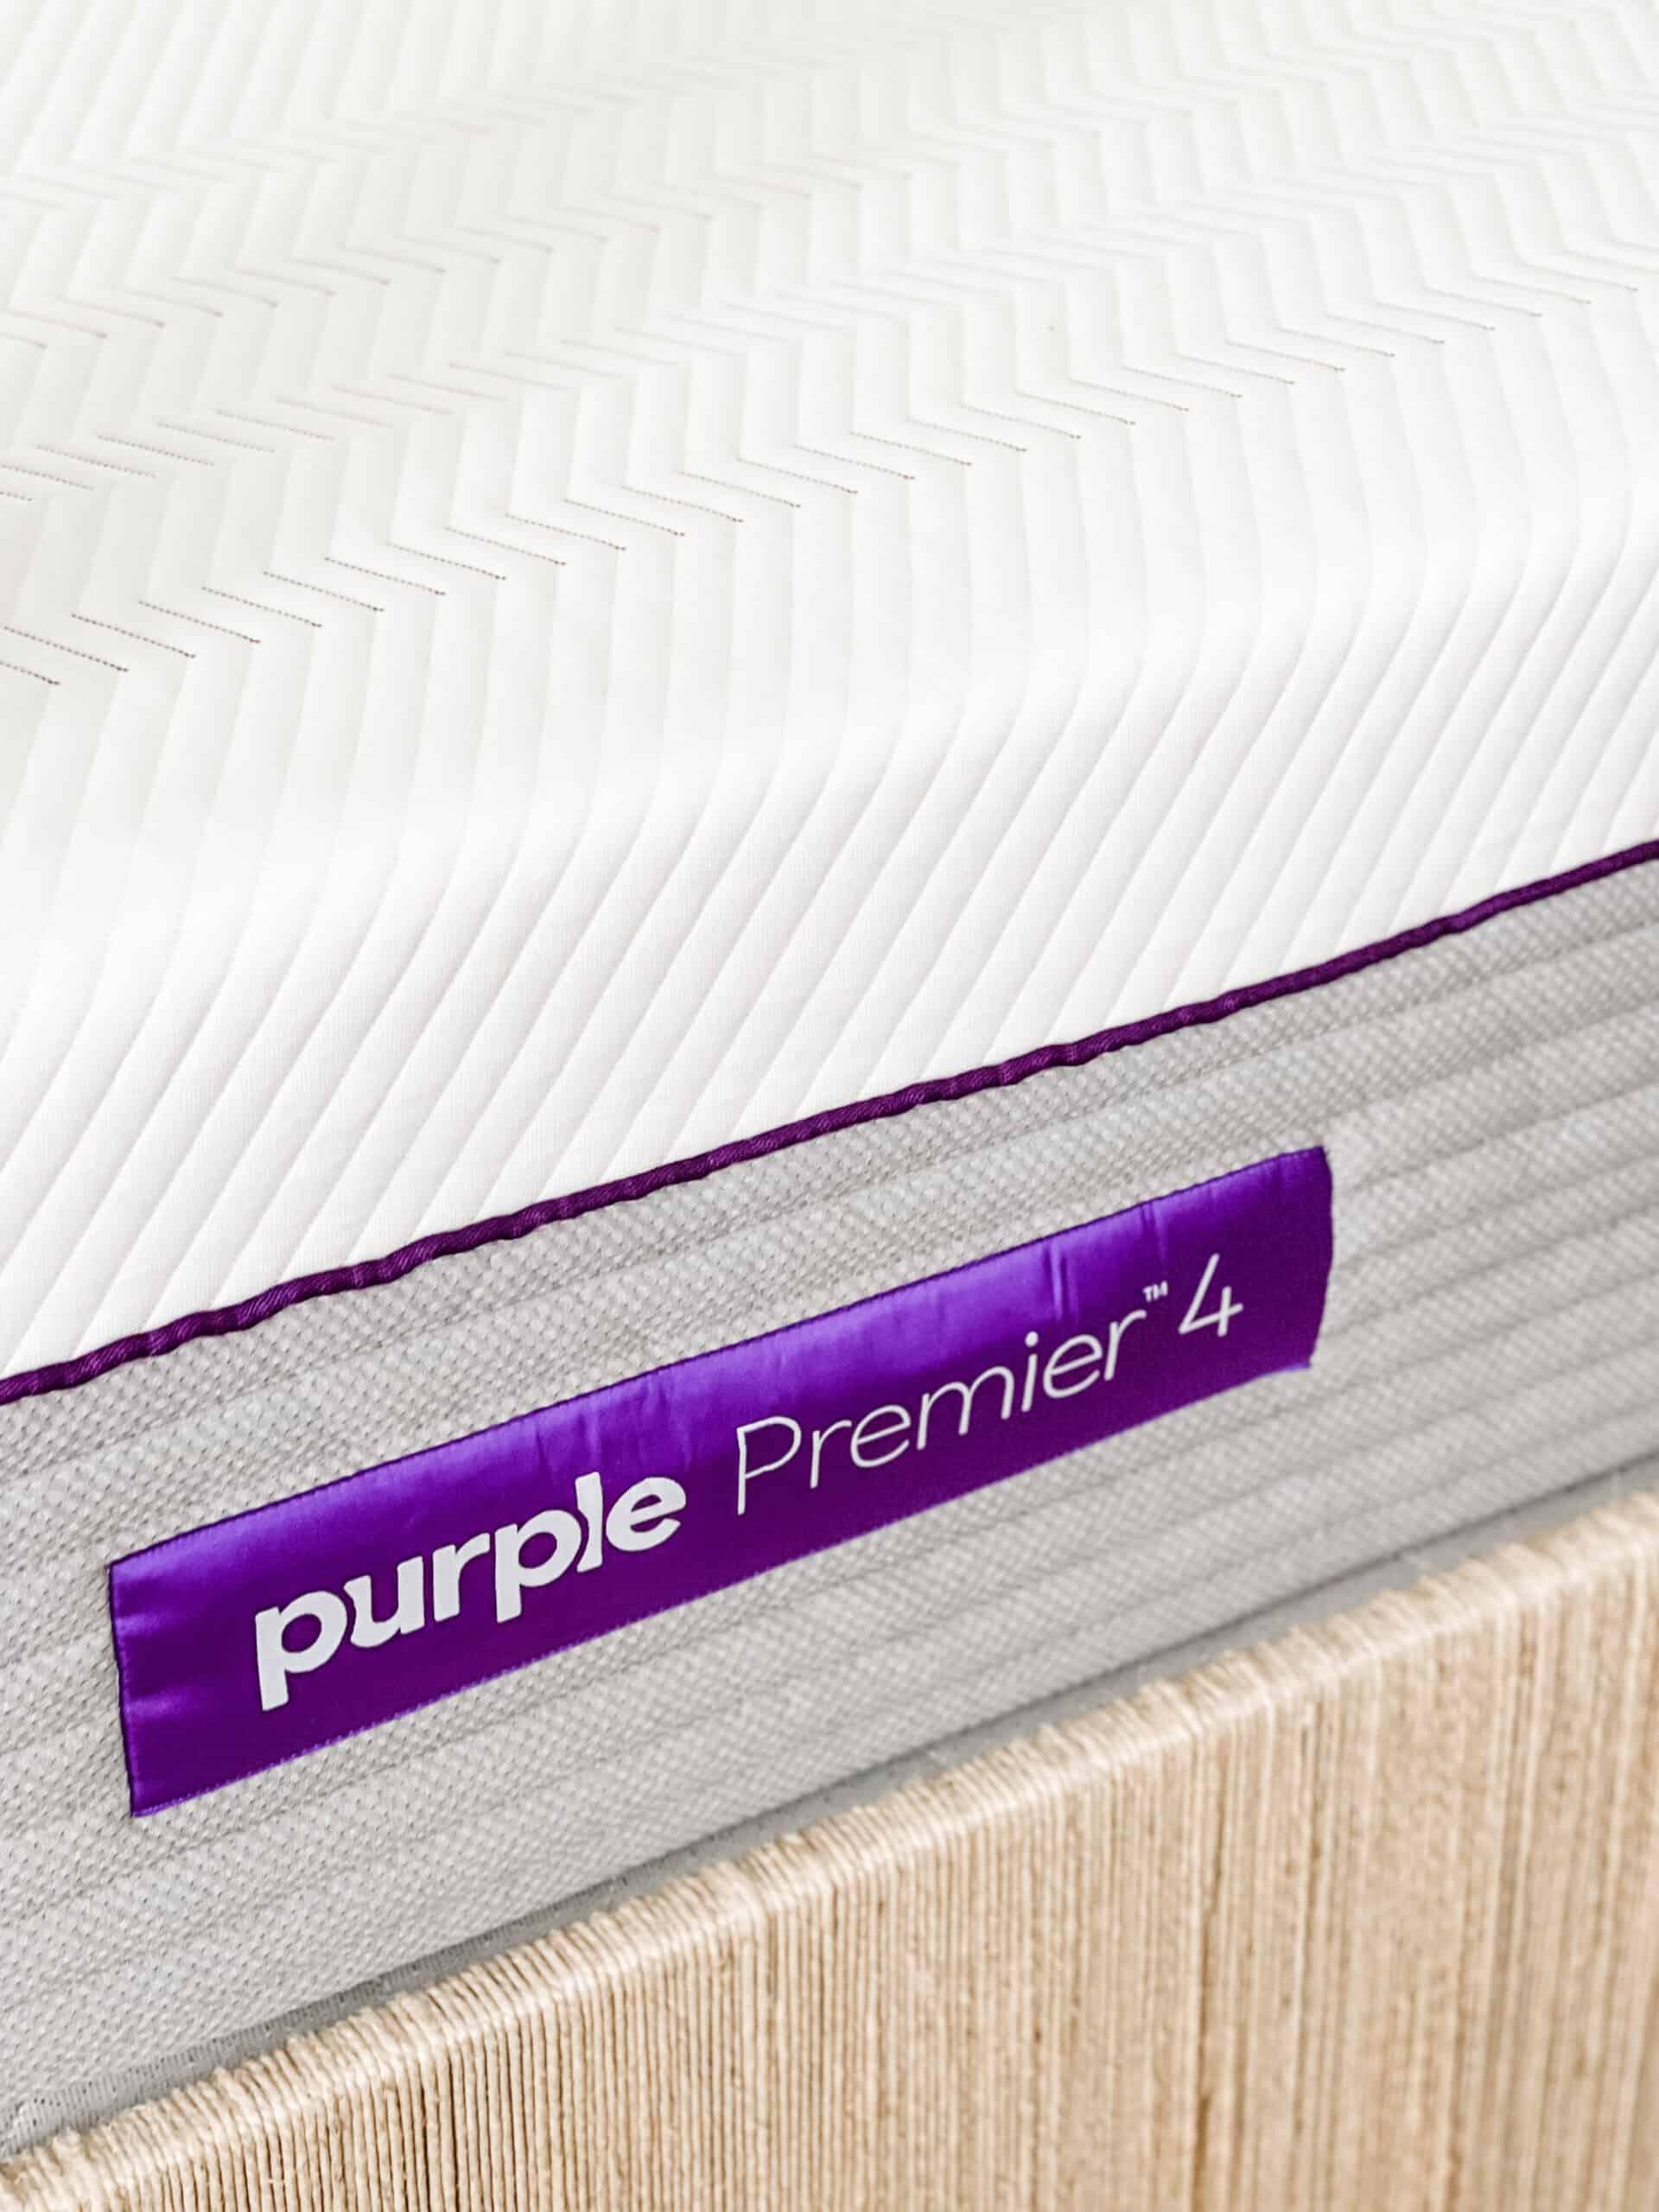 "Purple Premier 4"" mattress"